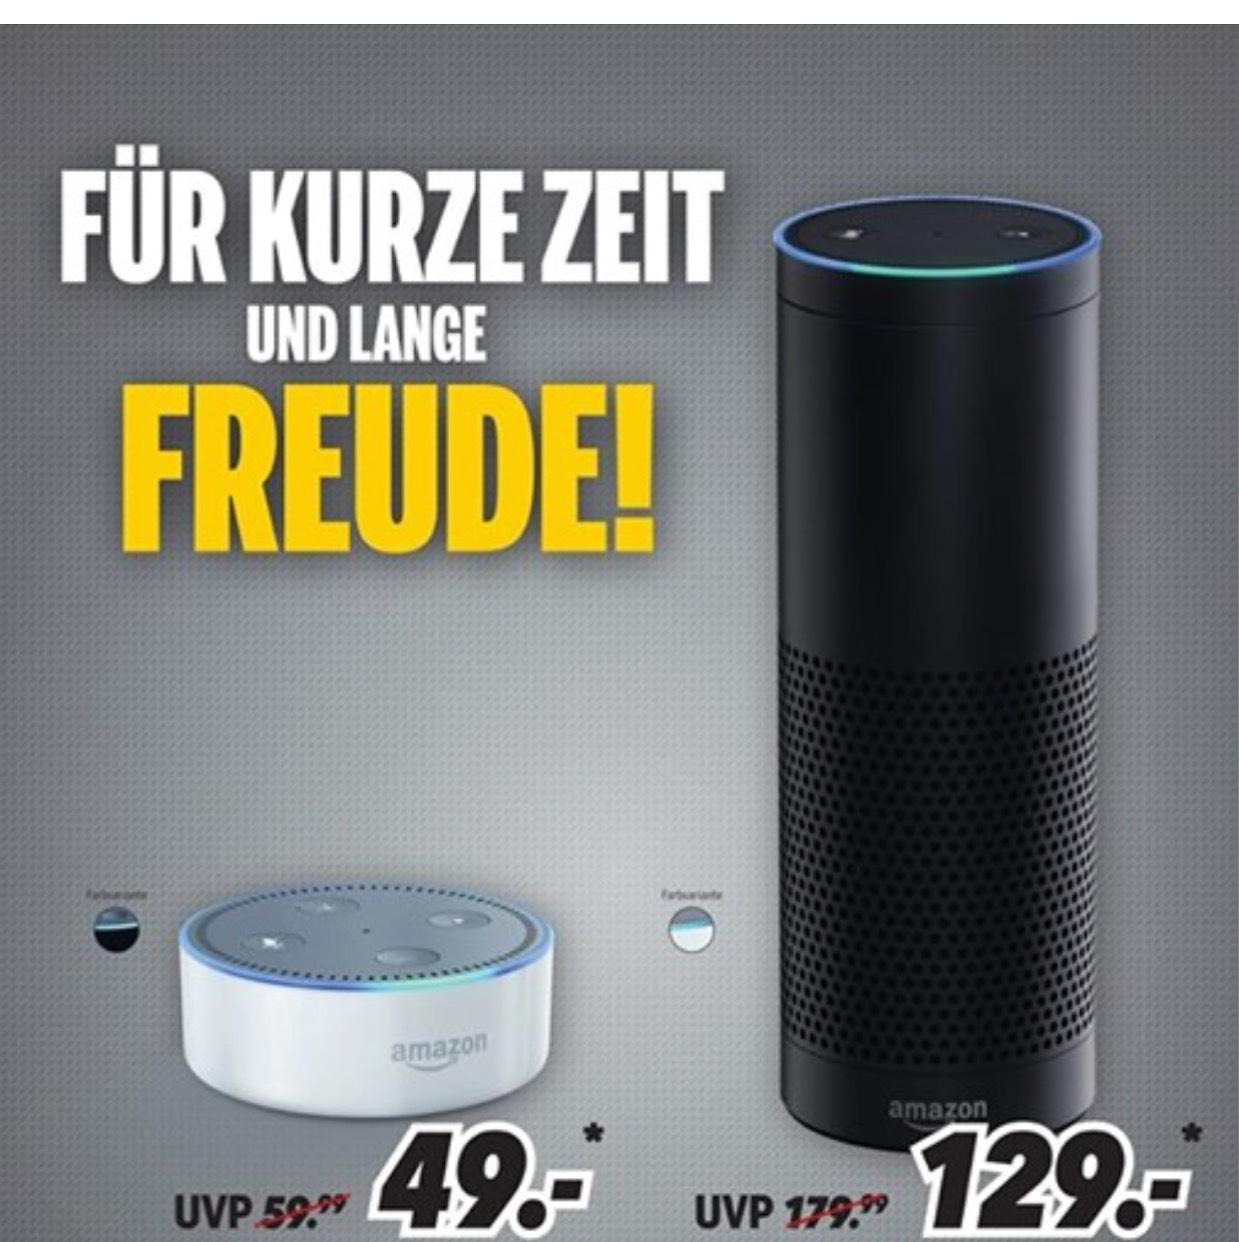 [lokal] Amazon Echo 129€ / Echo Dot 49€ - MEDIMAX Gera 28.08.-02.09.